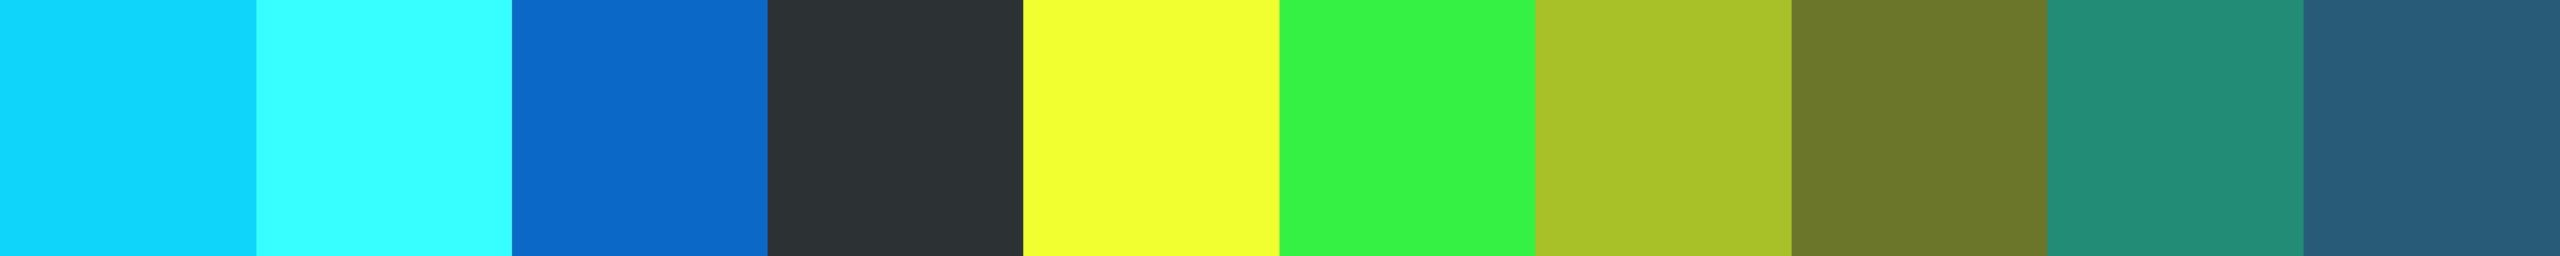 719 Wholoa Color Palette